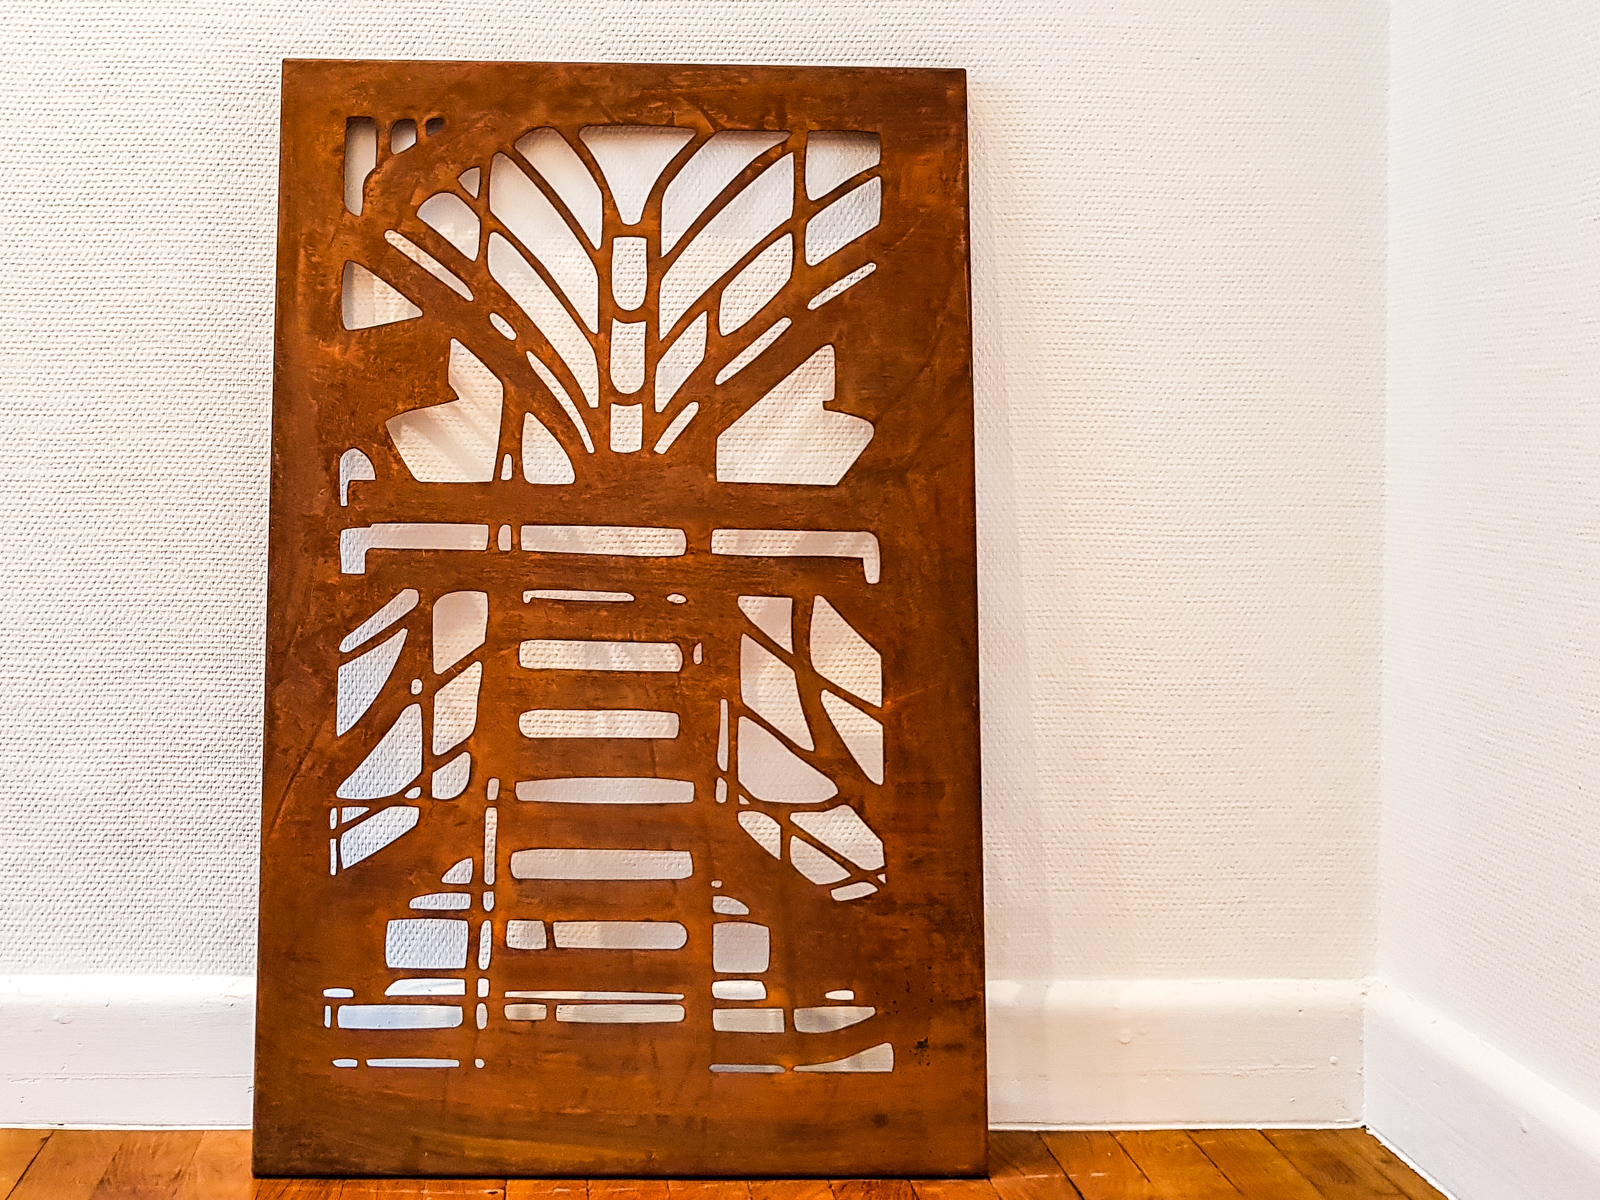 shadows of industrial past 2 - Metal Plate60 x 90 cmEUR 4.500